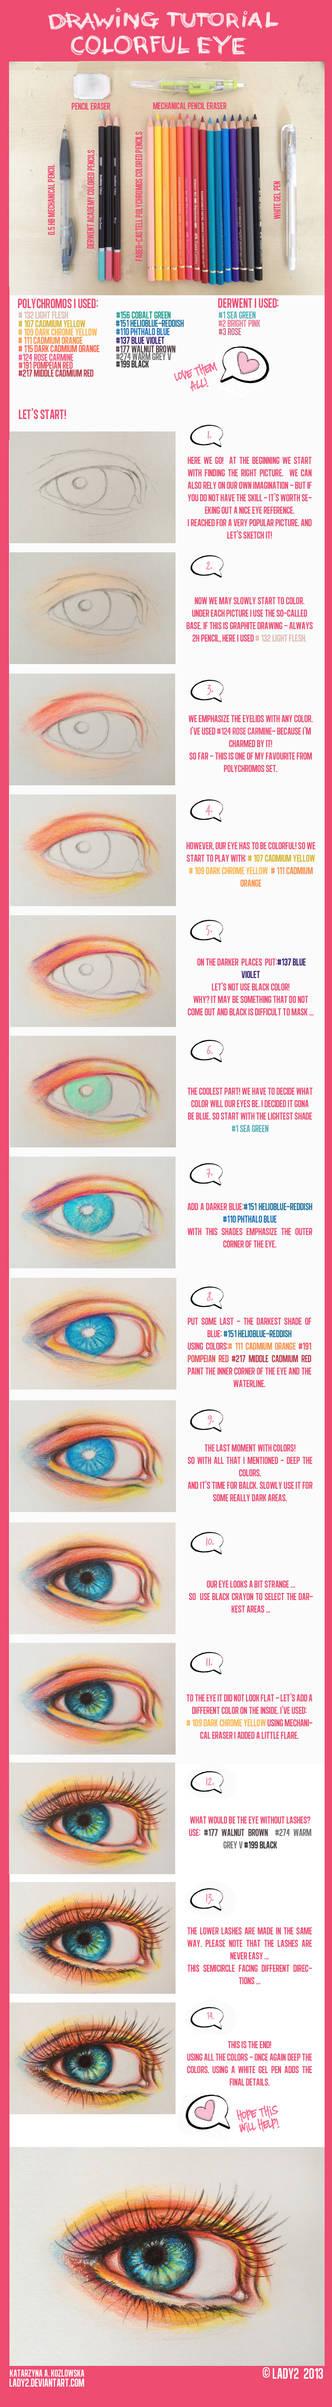 colored_pencil_eye_tutorial.